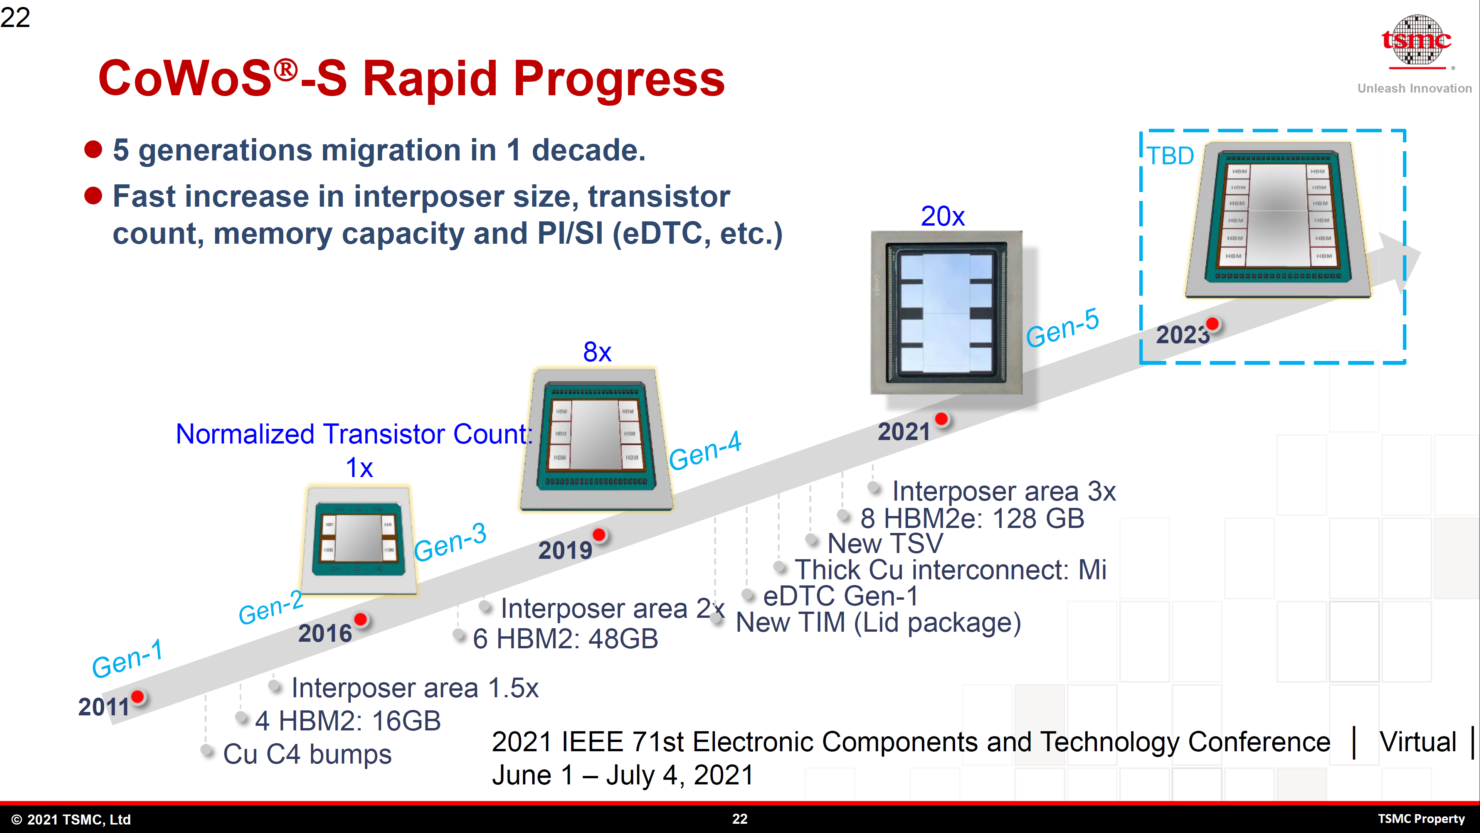 tsmc-advanced-packaging-technologies-cowos-_5